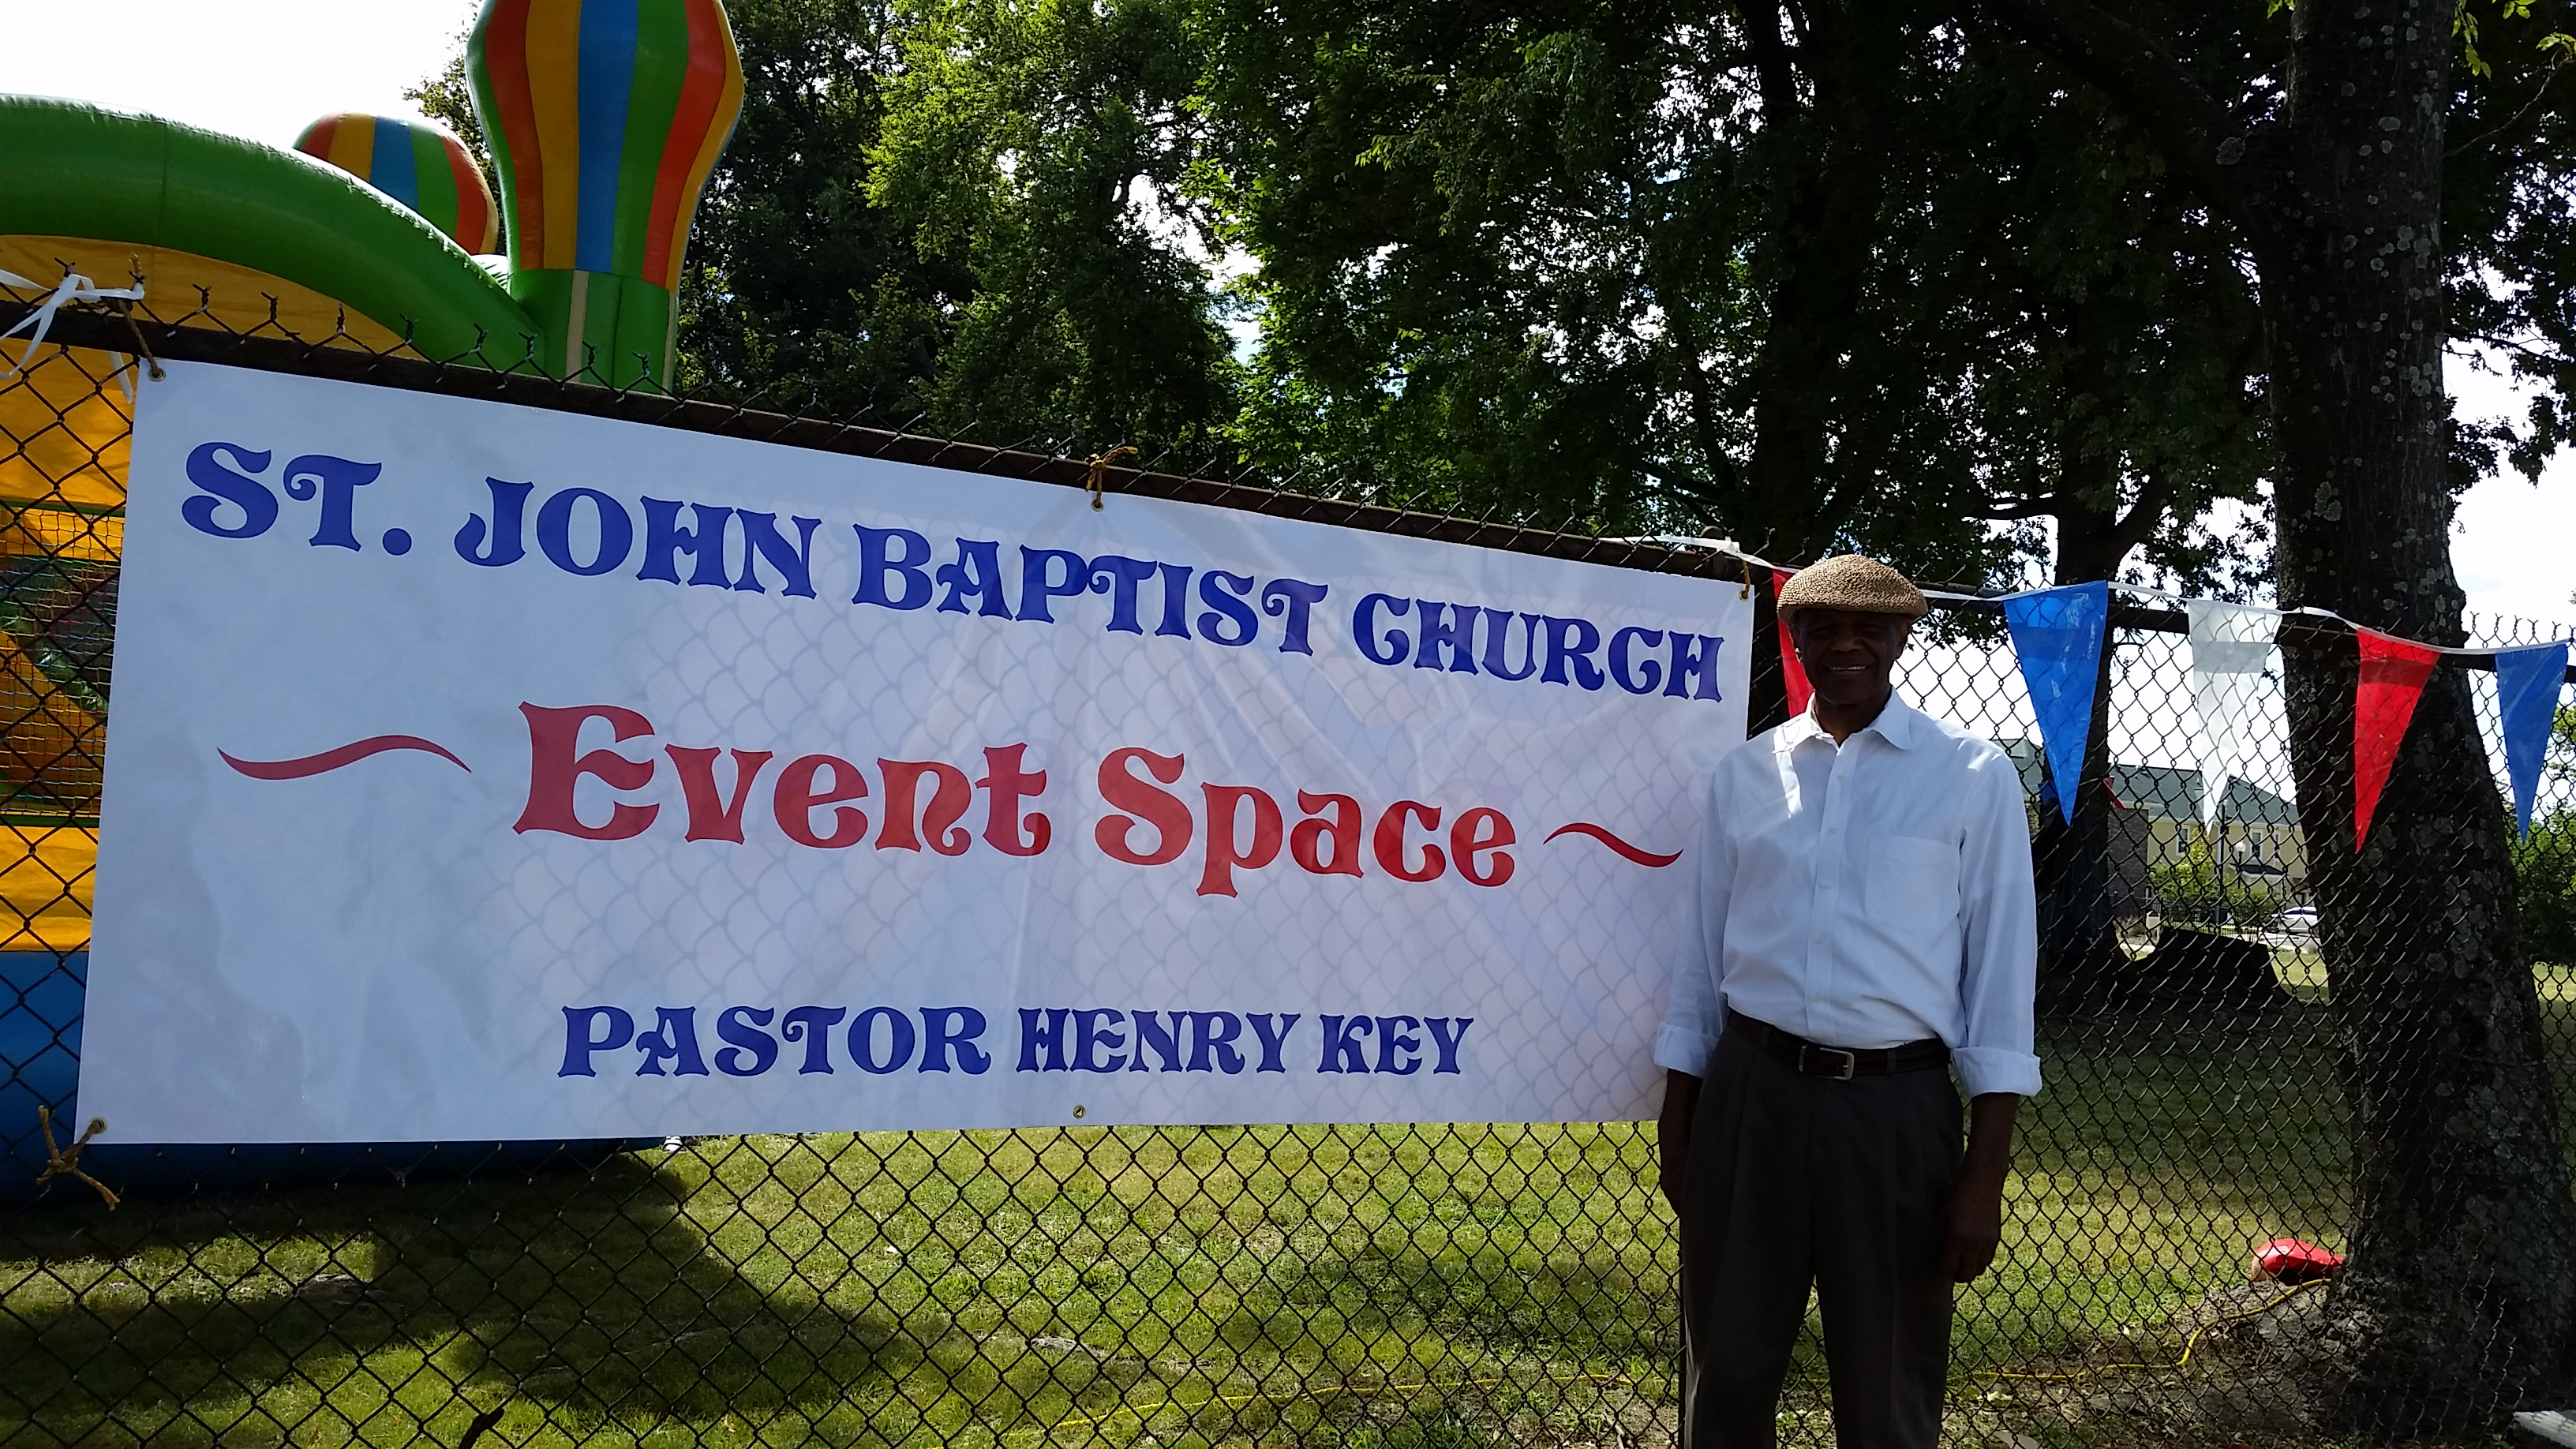 Pastorandsign